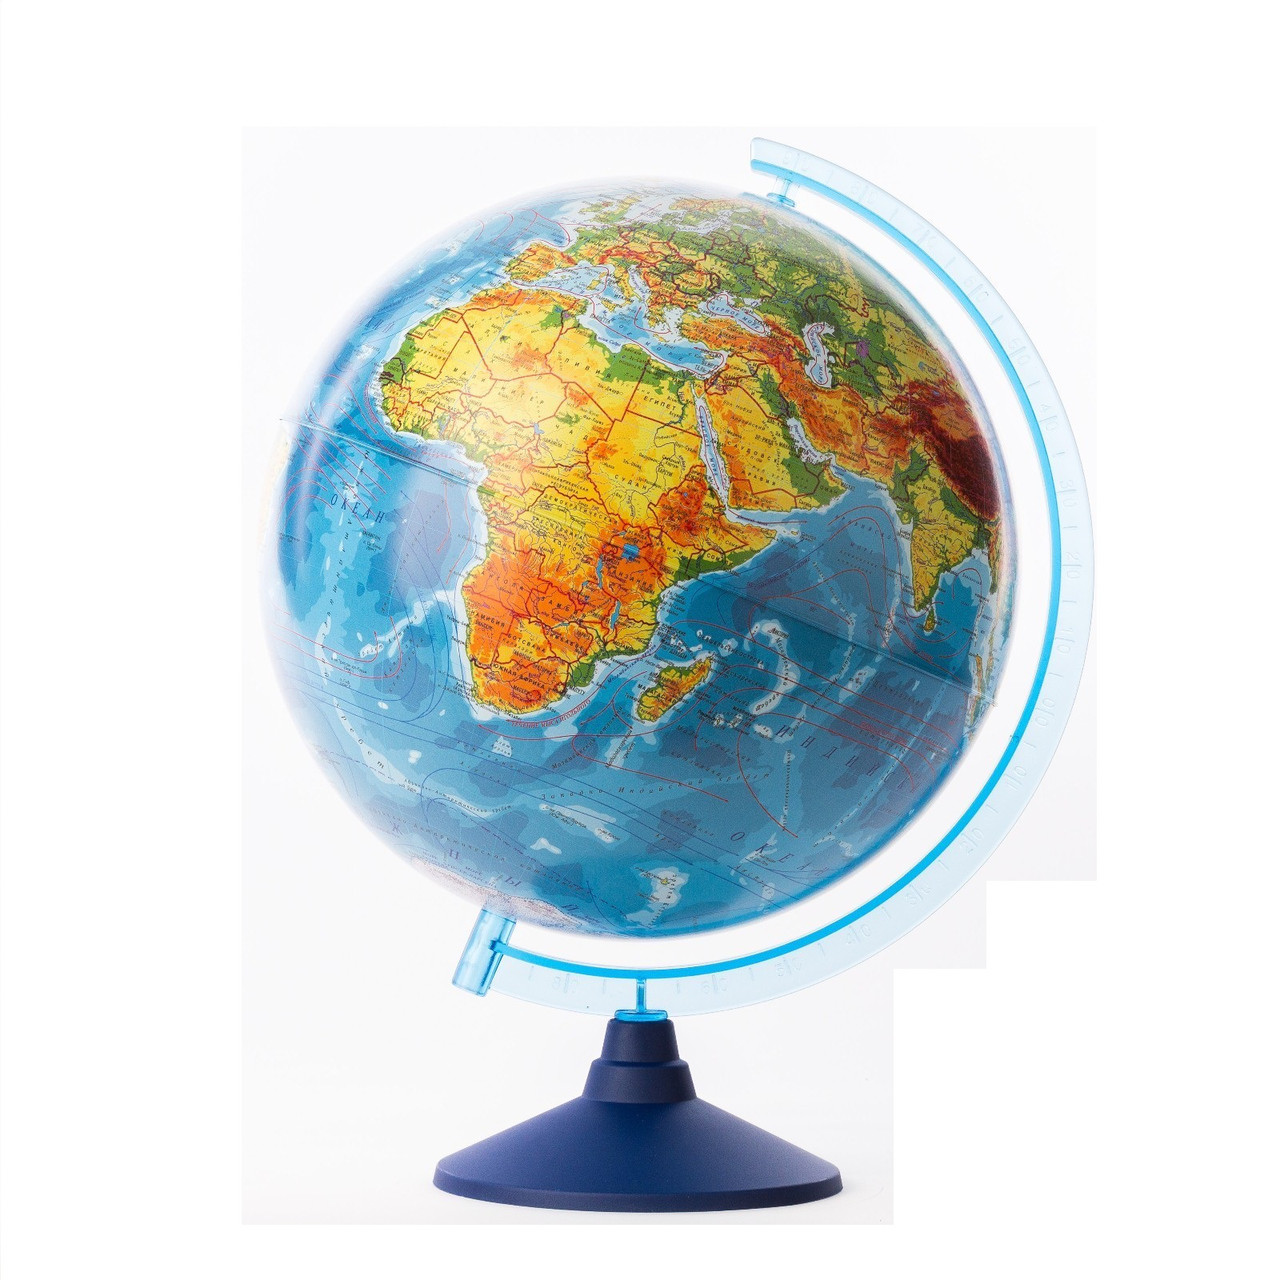 Физико-политический глобус, 32 см (подсветка)